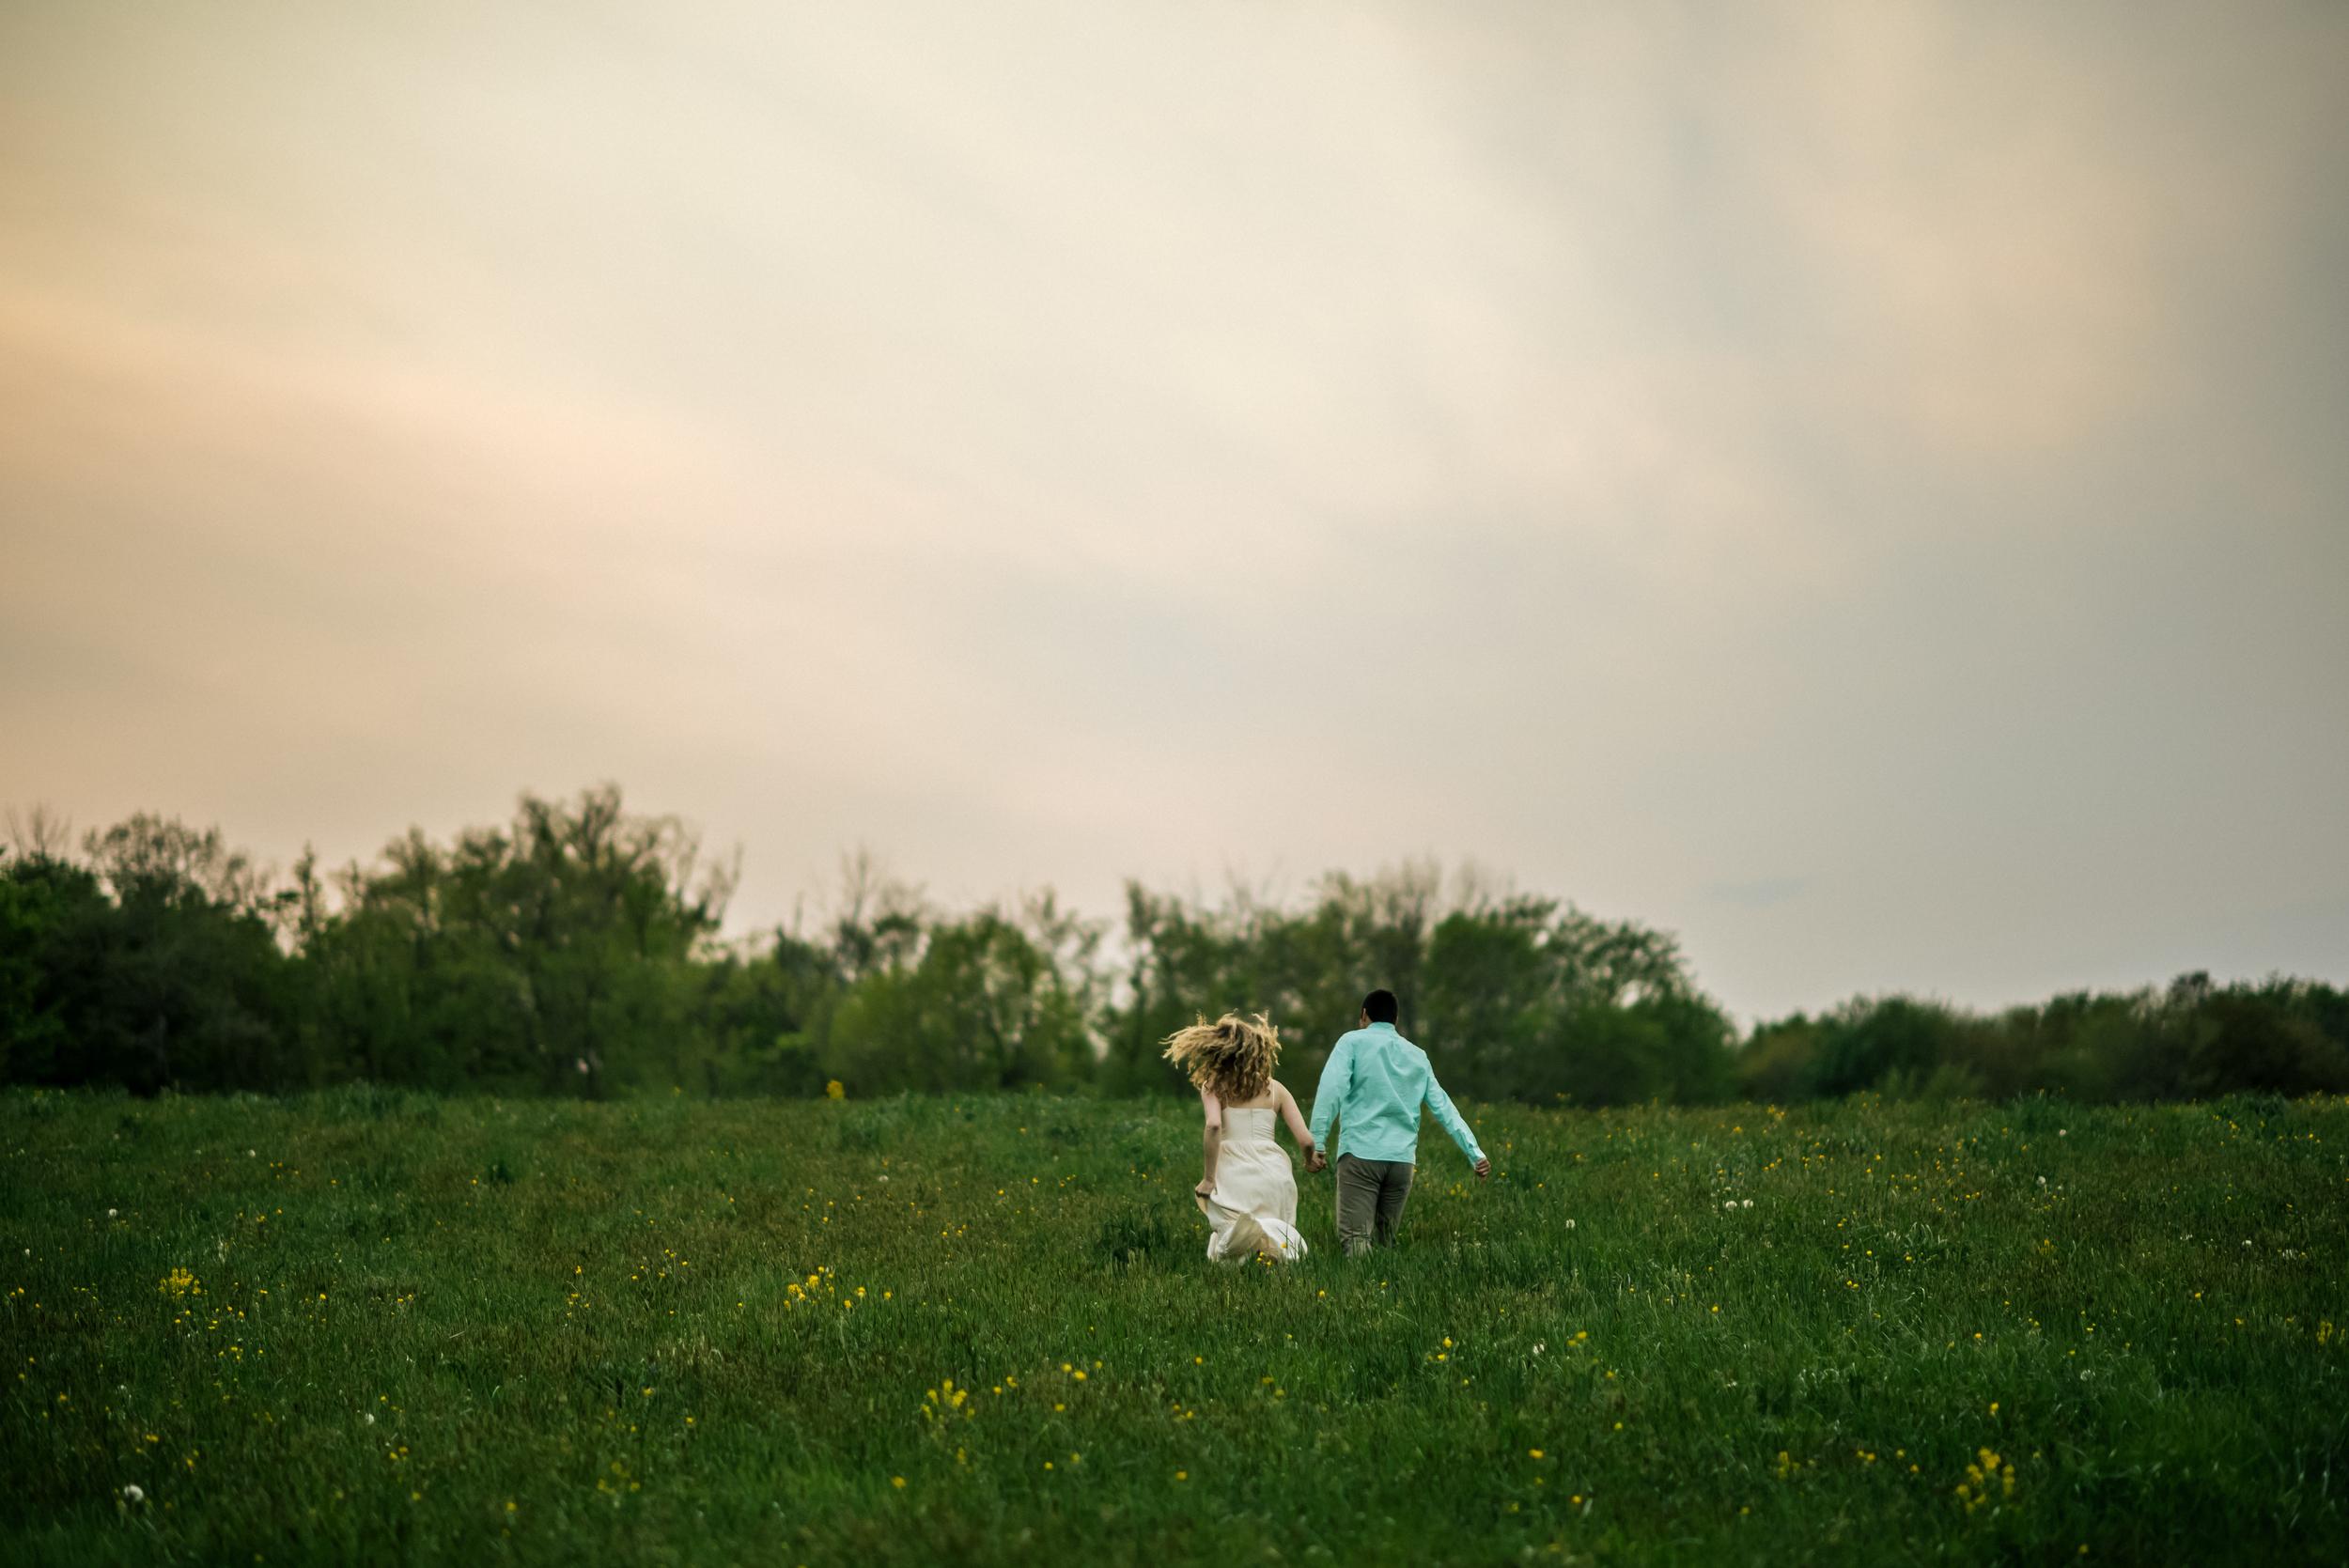 Enagement session in huntsburg ohio gaelle and juan nick plus danee photography